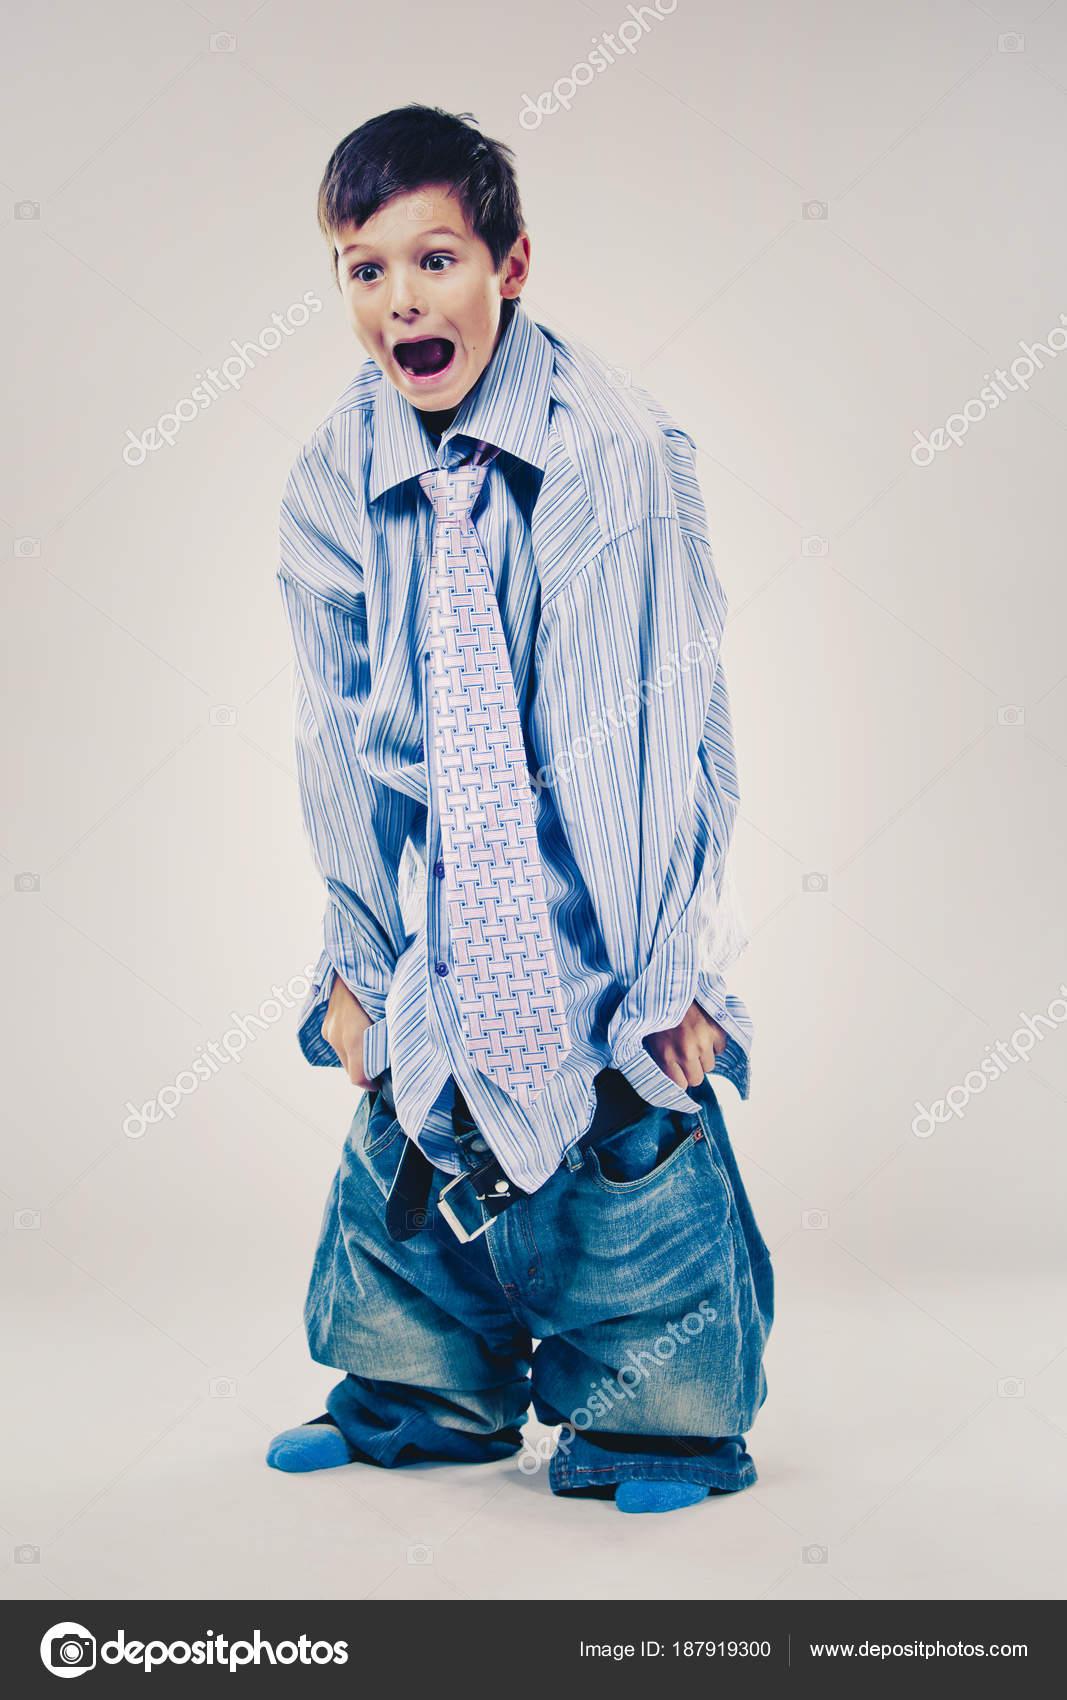 Cảm Cười...chơi - Page 40 Depositphotos_187919300-stock-photo-funny-boy-wearing-dads-clothes